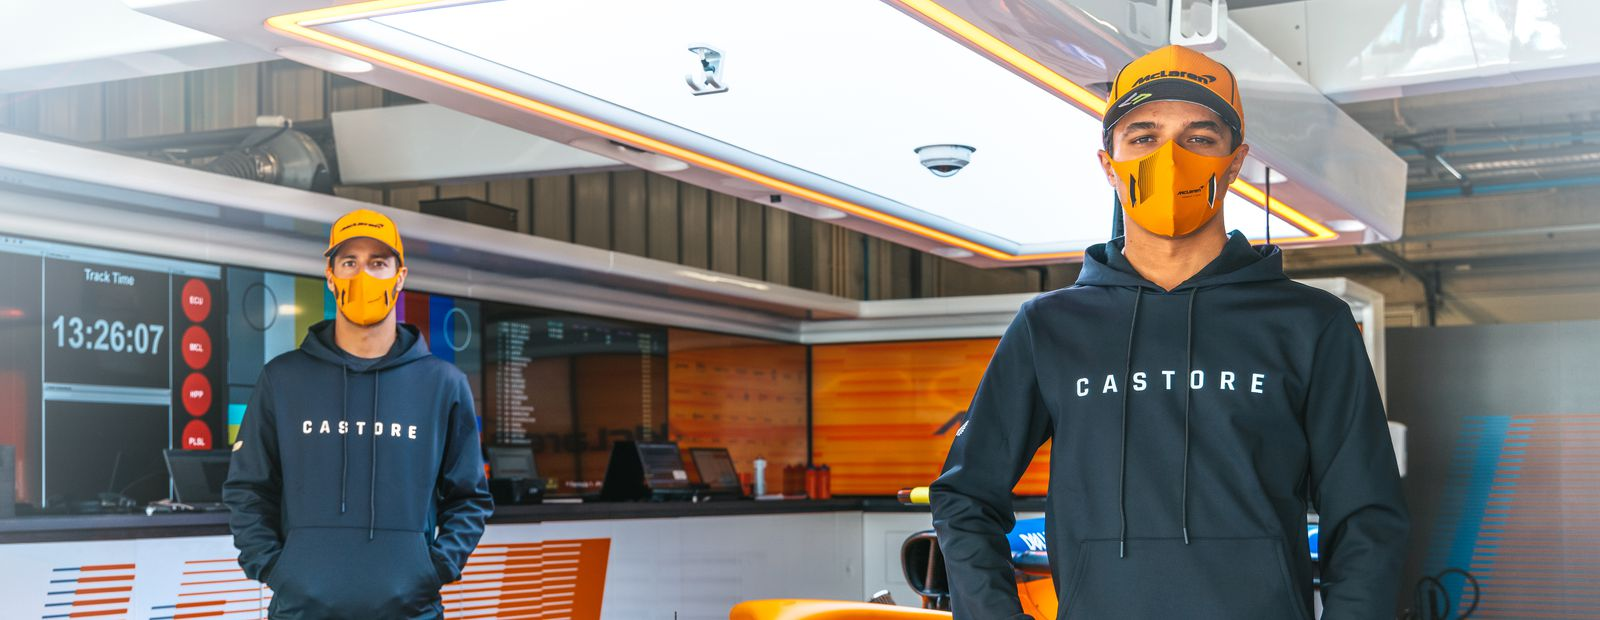 Castore becomes Official Team Apparel and Sportswear Partner for the McLaren Formula 1 team